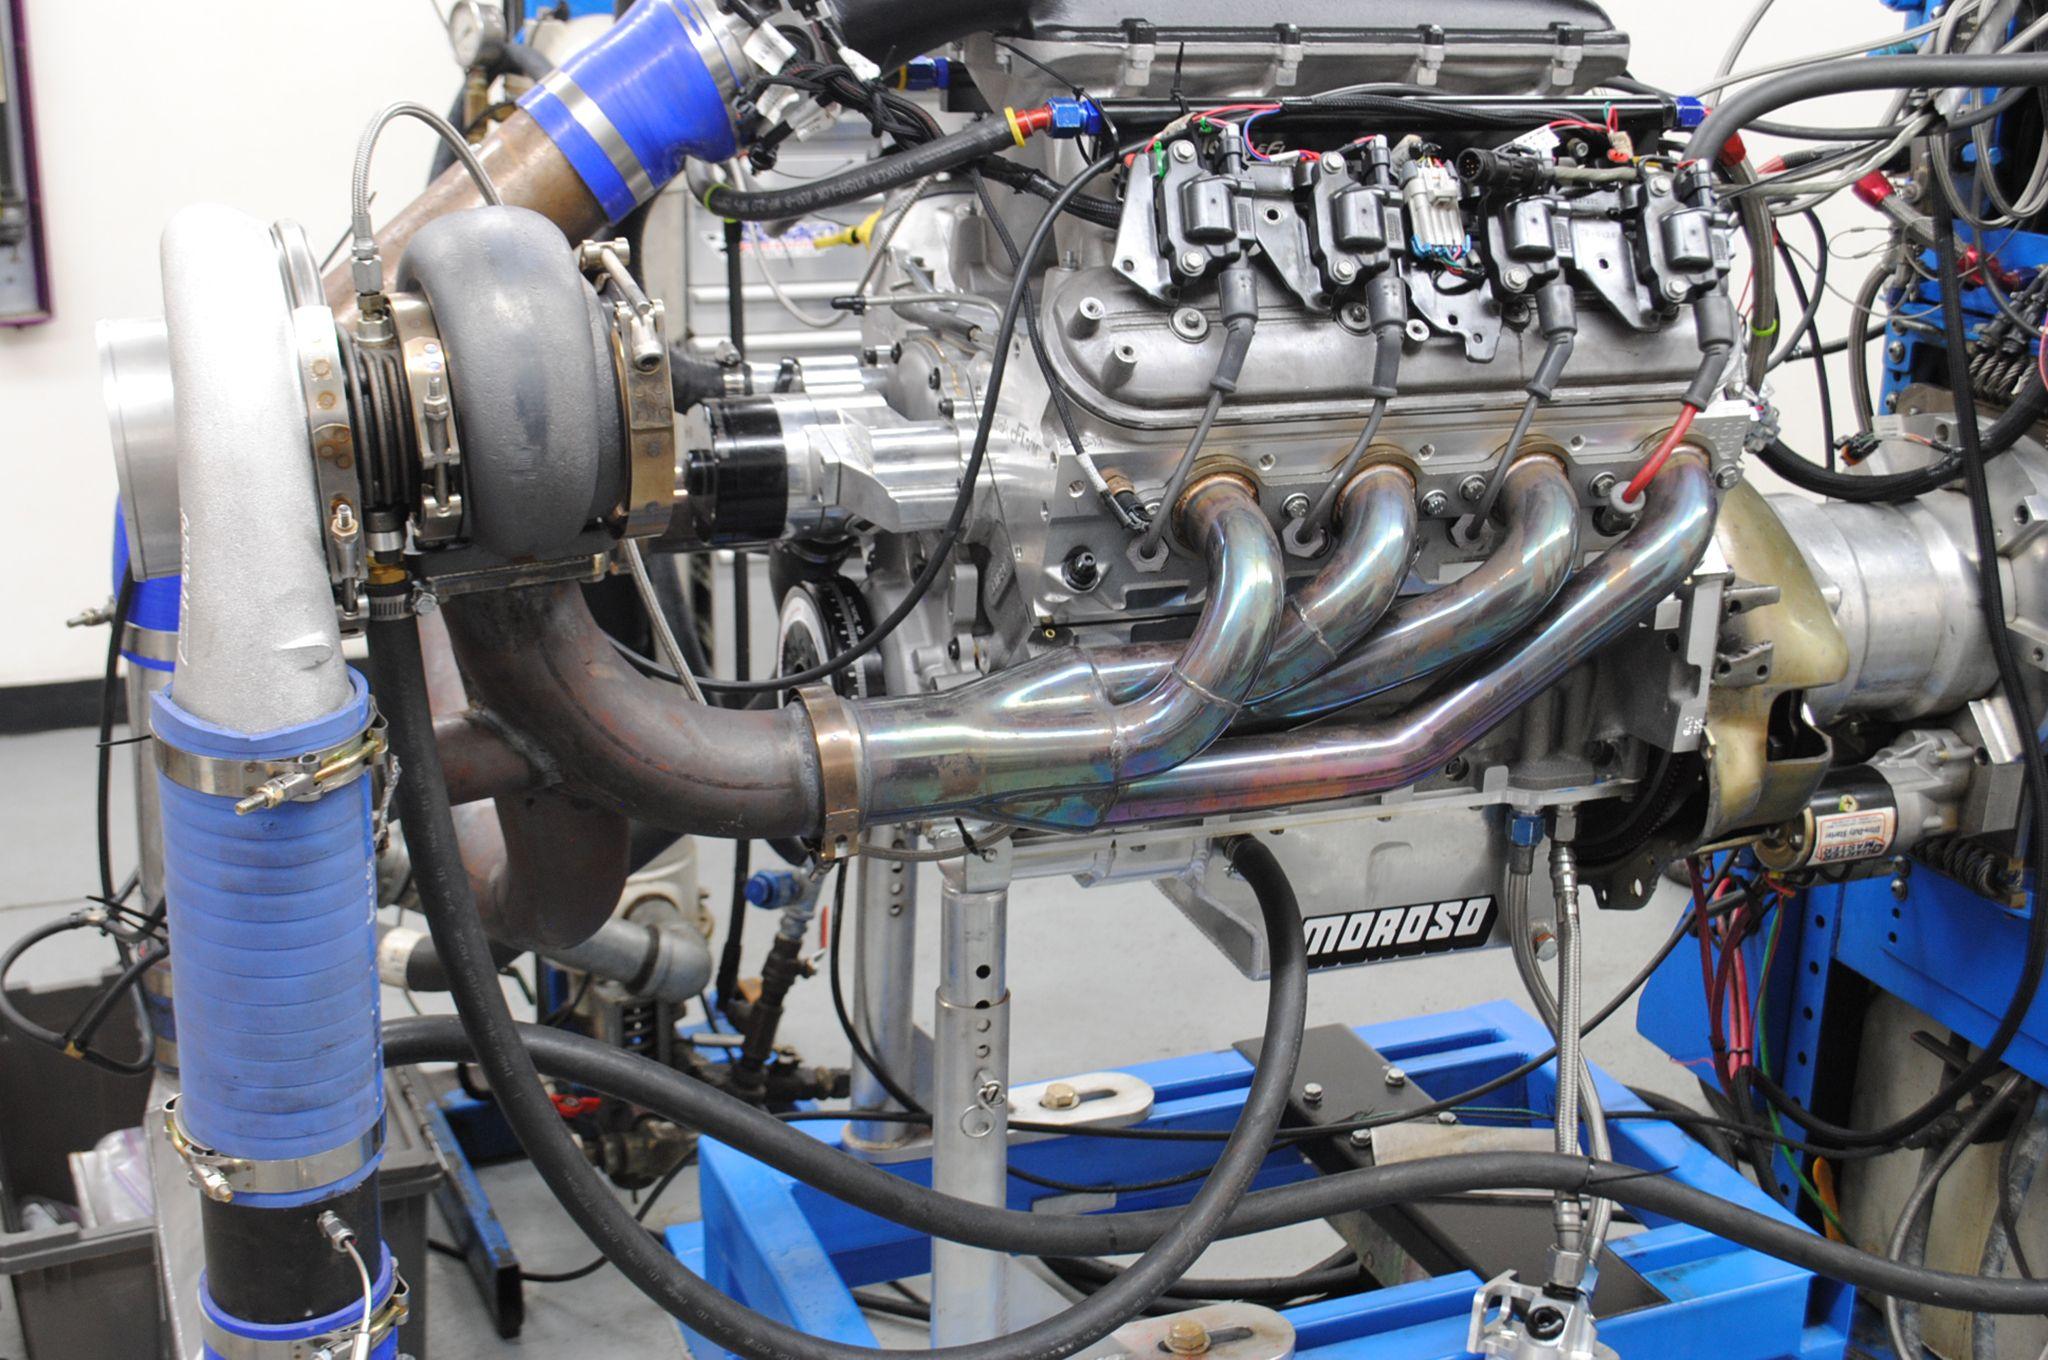 Pin on Ls engine build